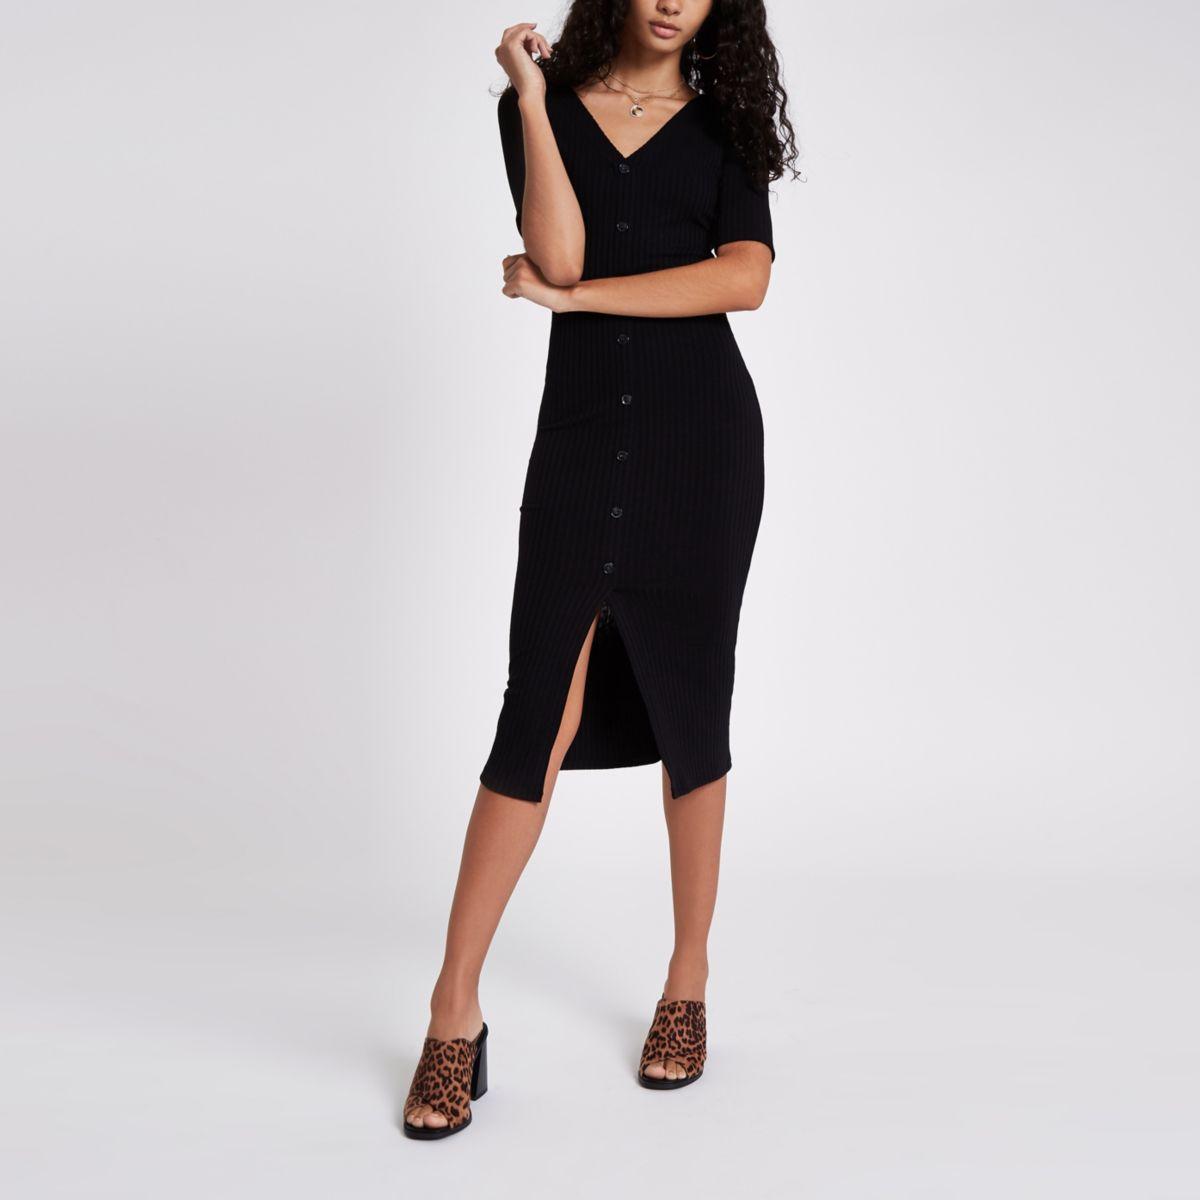 Black rib button midi bodycon dress